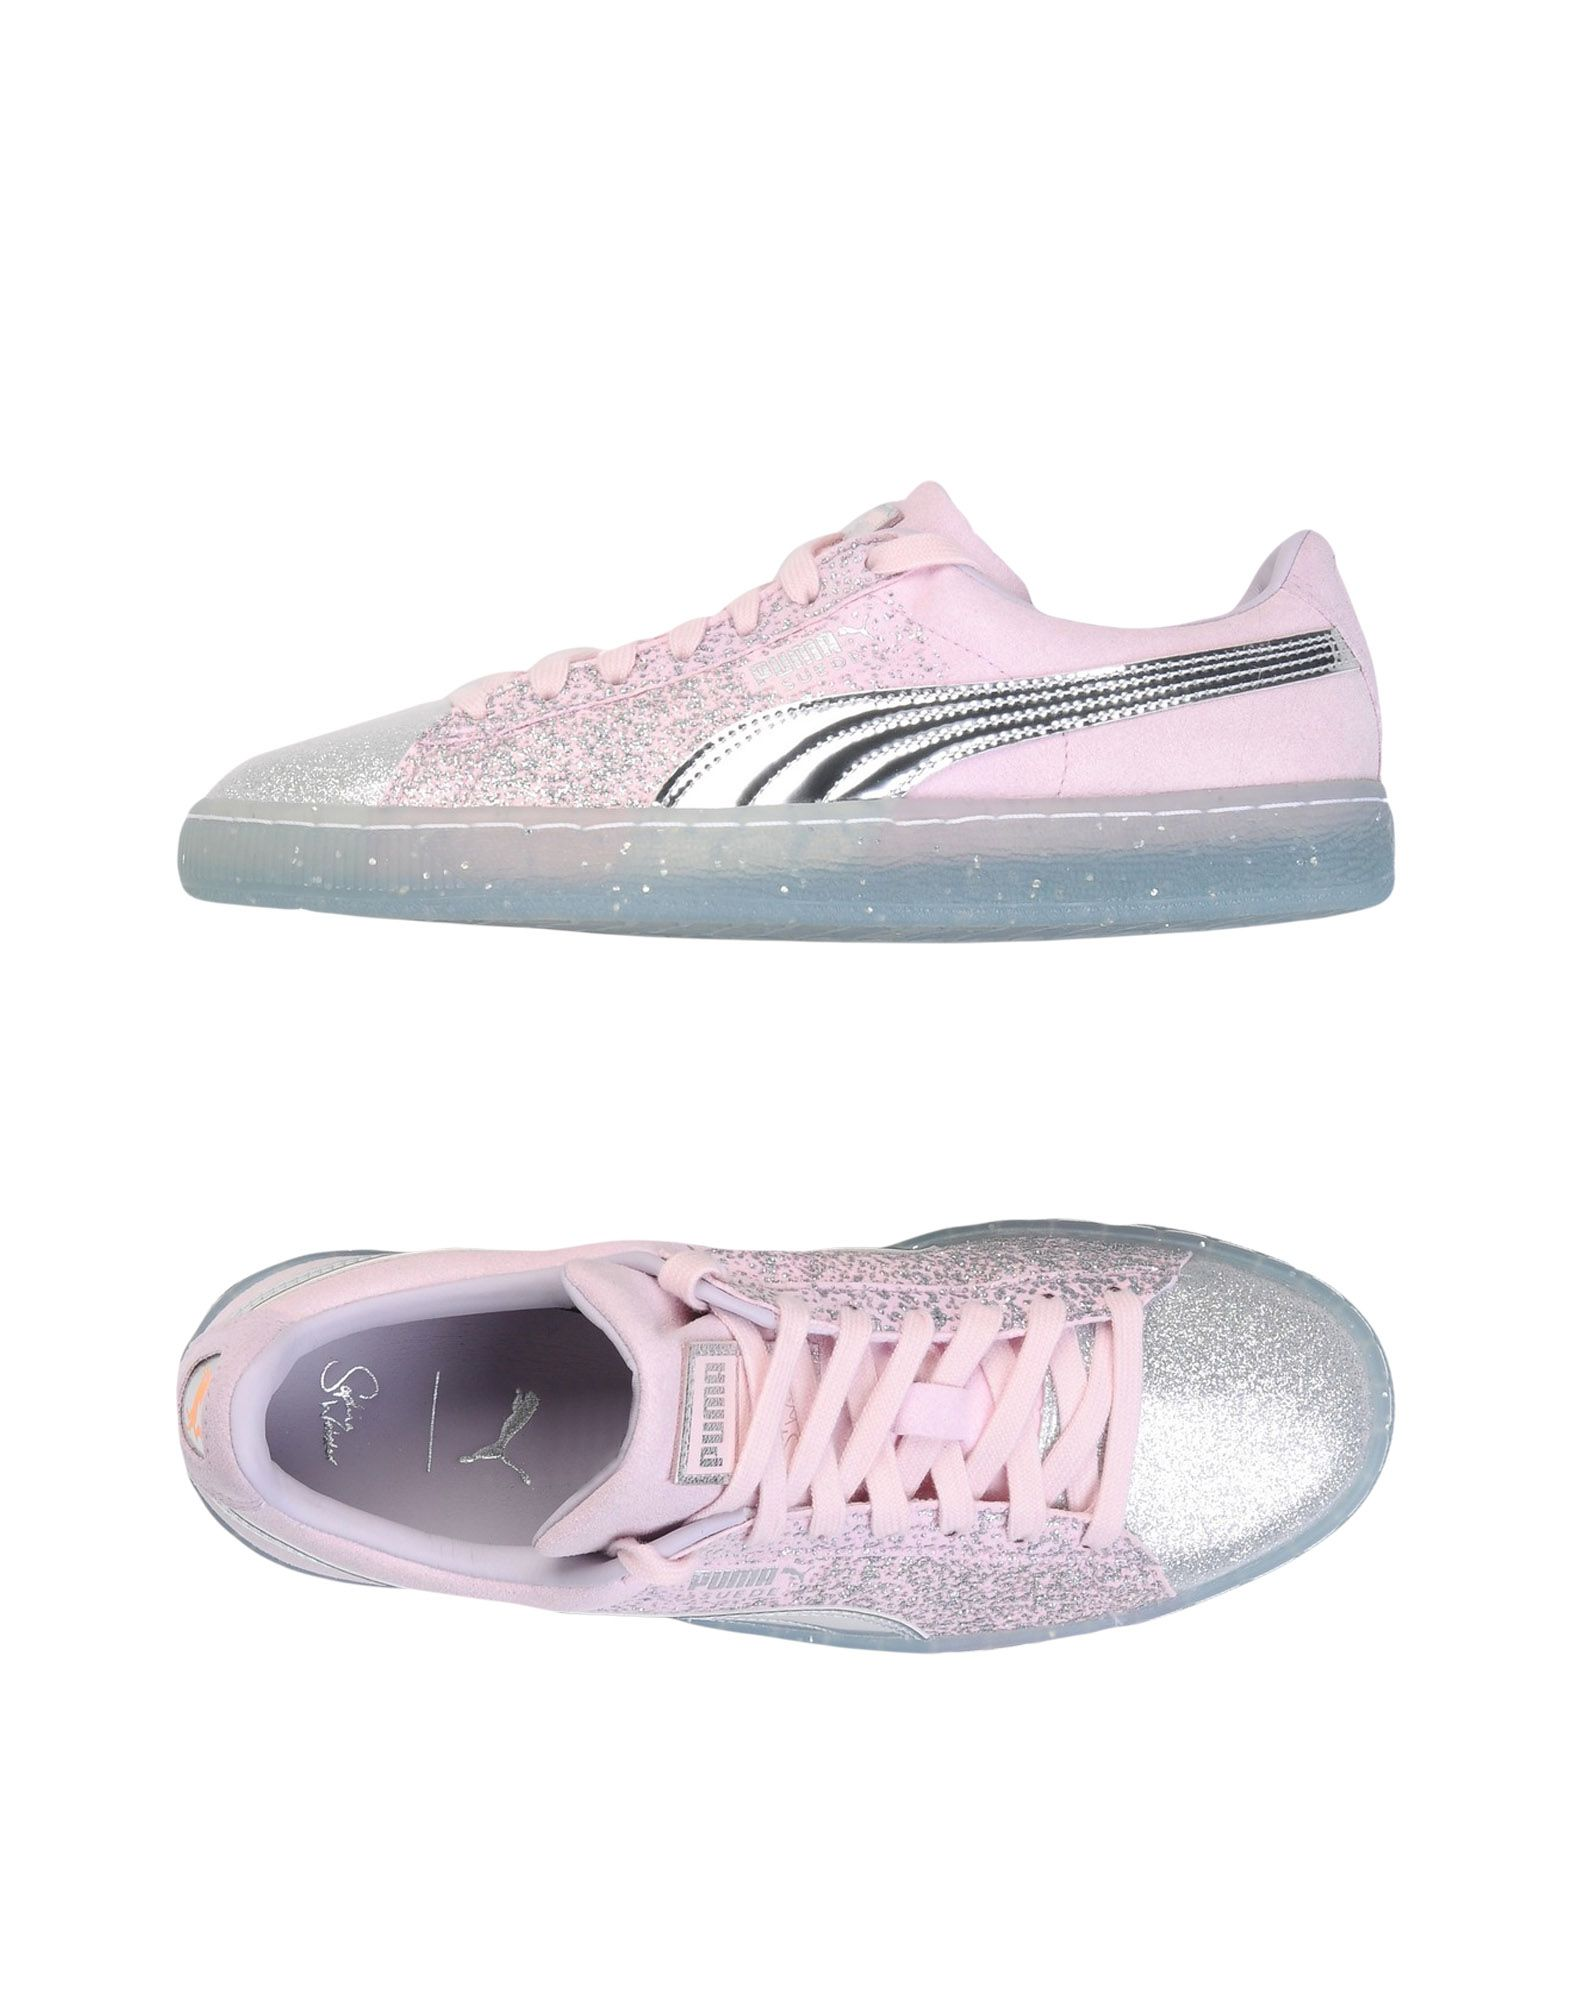 Sneakers Puma X Sophia Webster Suede Glitter Princess Sw - Donna - Acquista online su